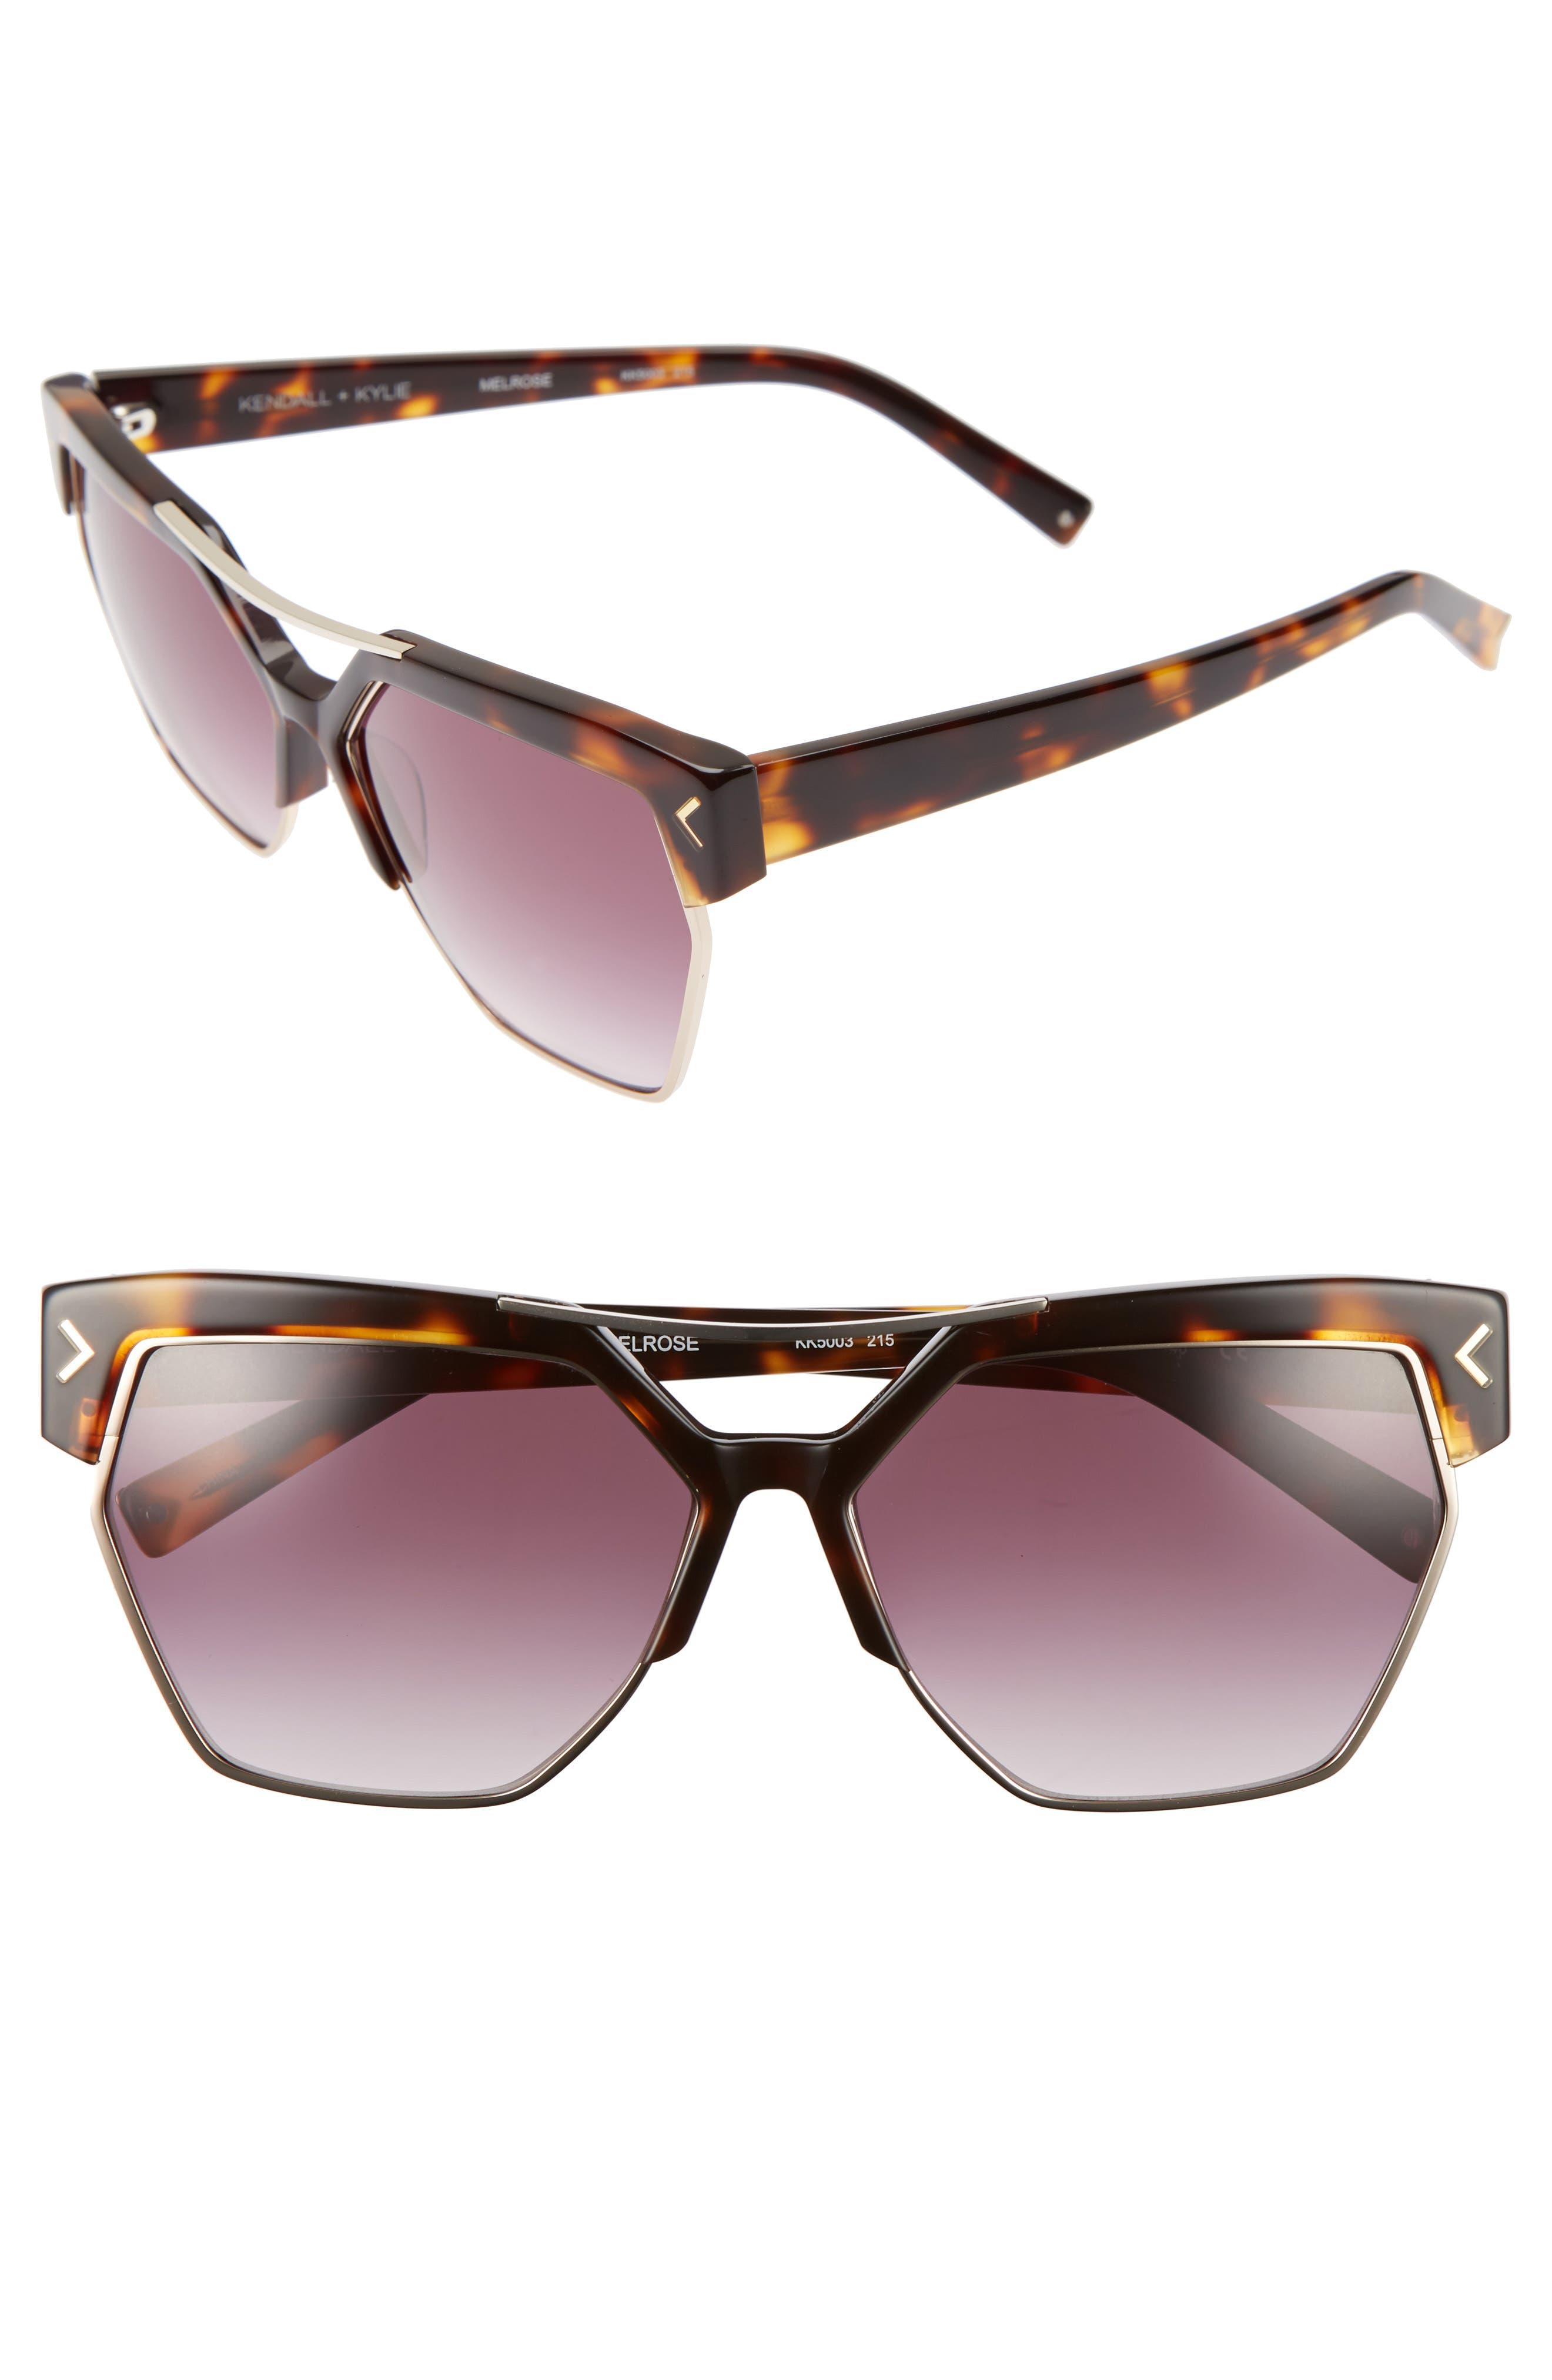 55mm Retro Sunglasses,                             Alternate thumbnail 6, color,